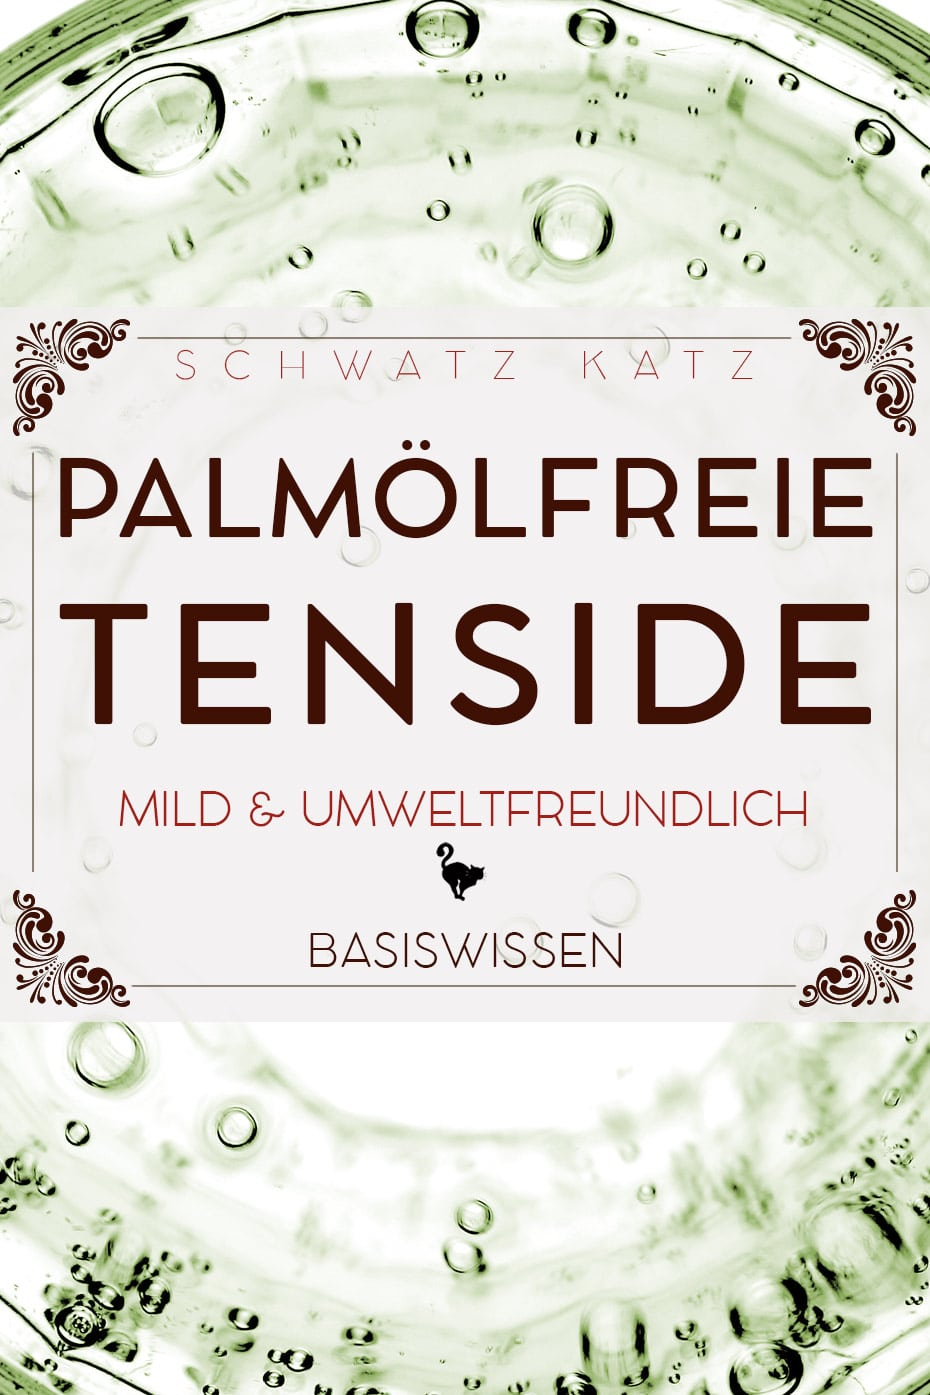 Anionische Tenside | Schwatz Katz